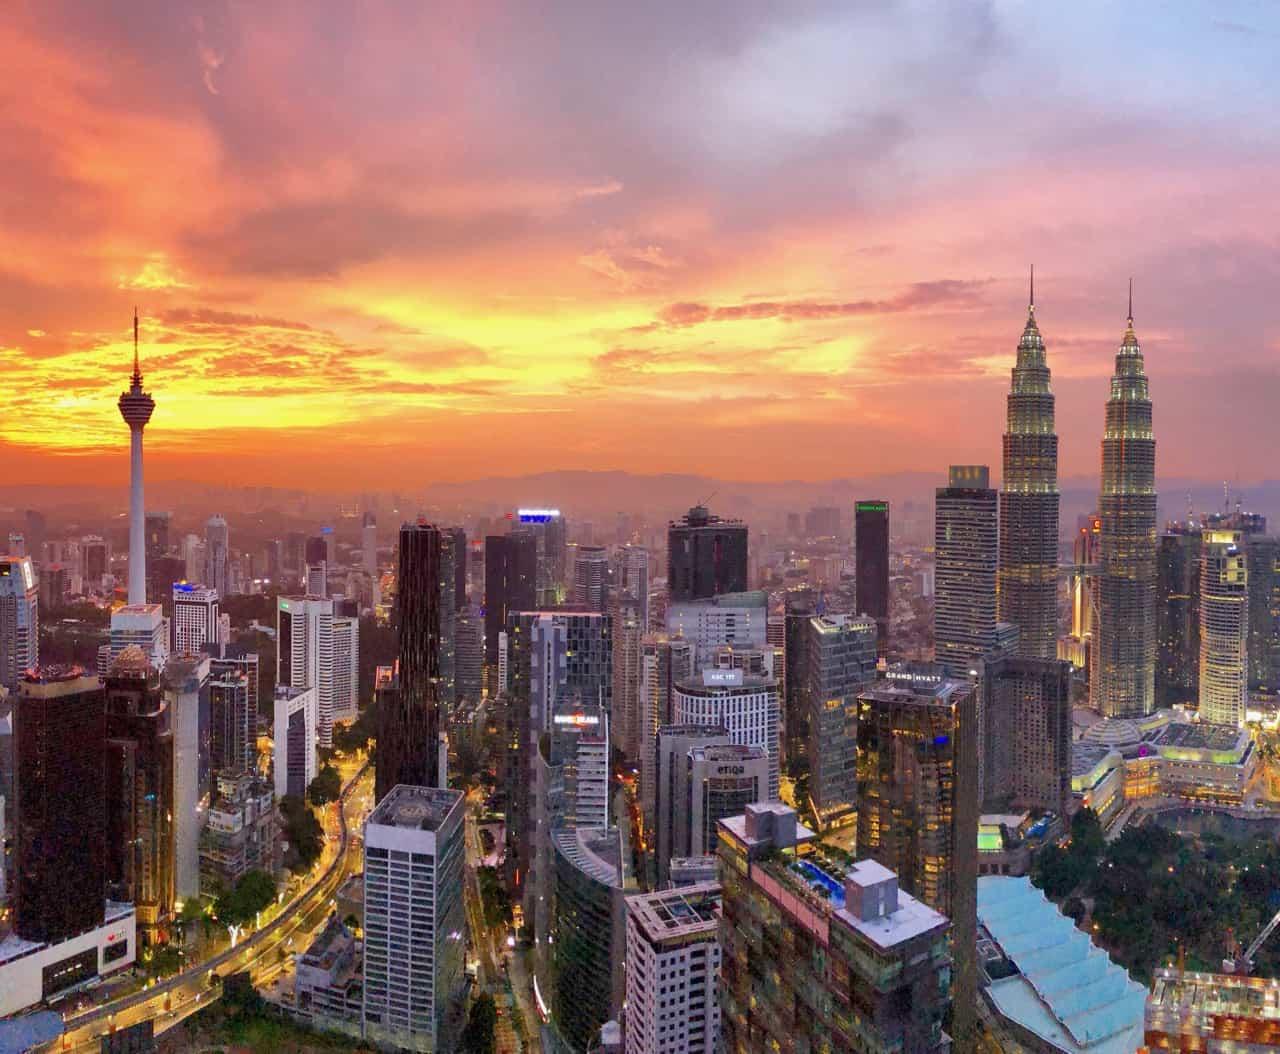 A stunning sunset in Kuala Lumpur